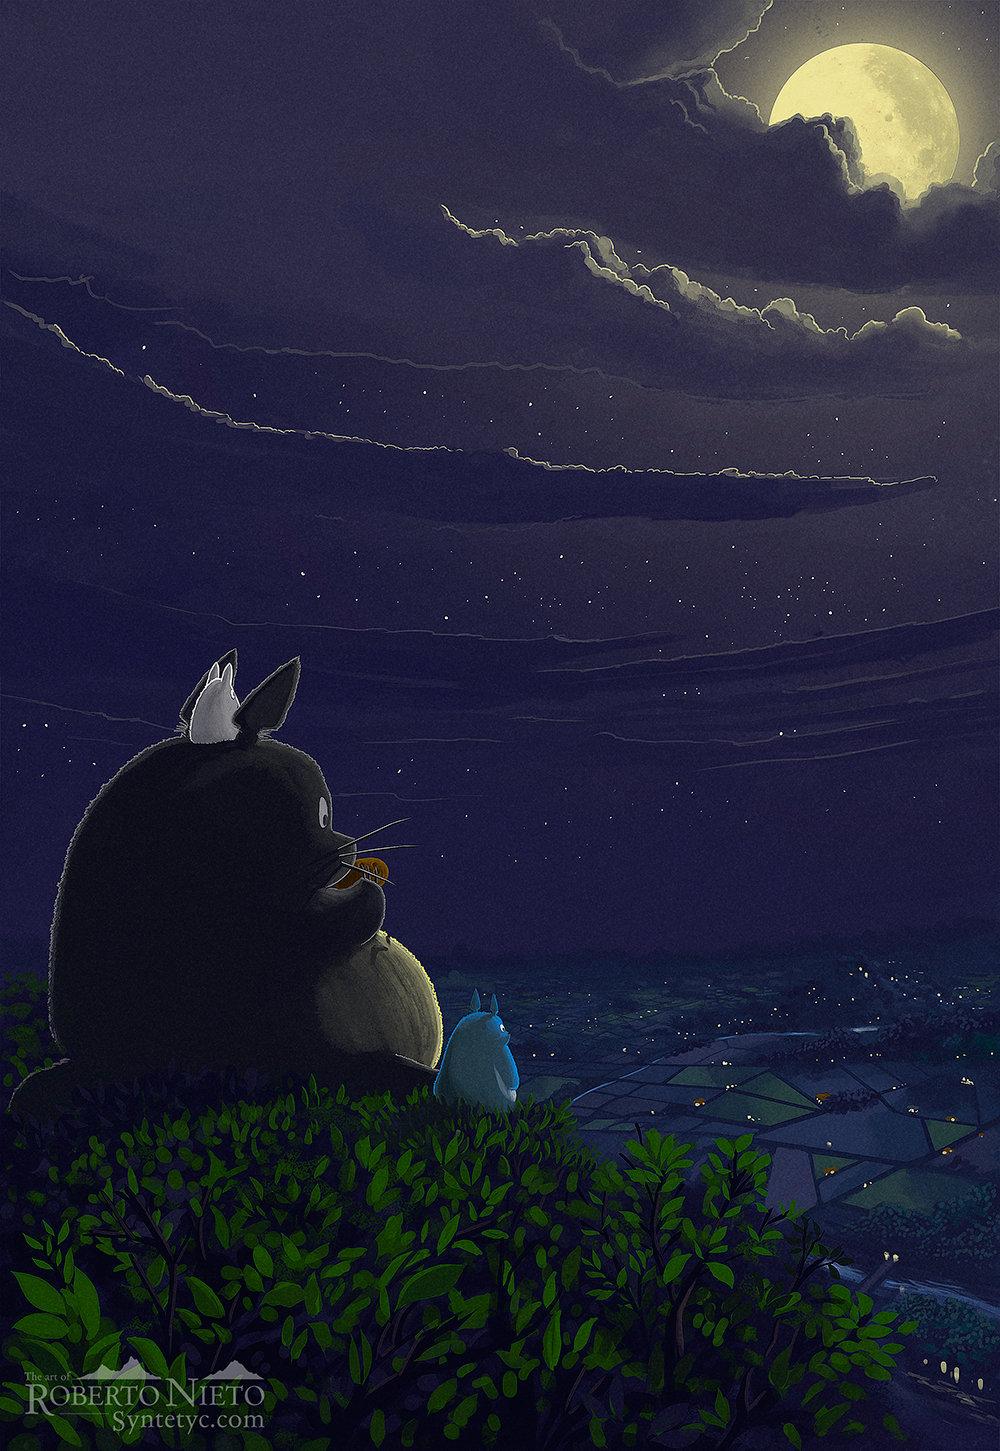 Totoro playing the ocarina